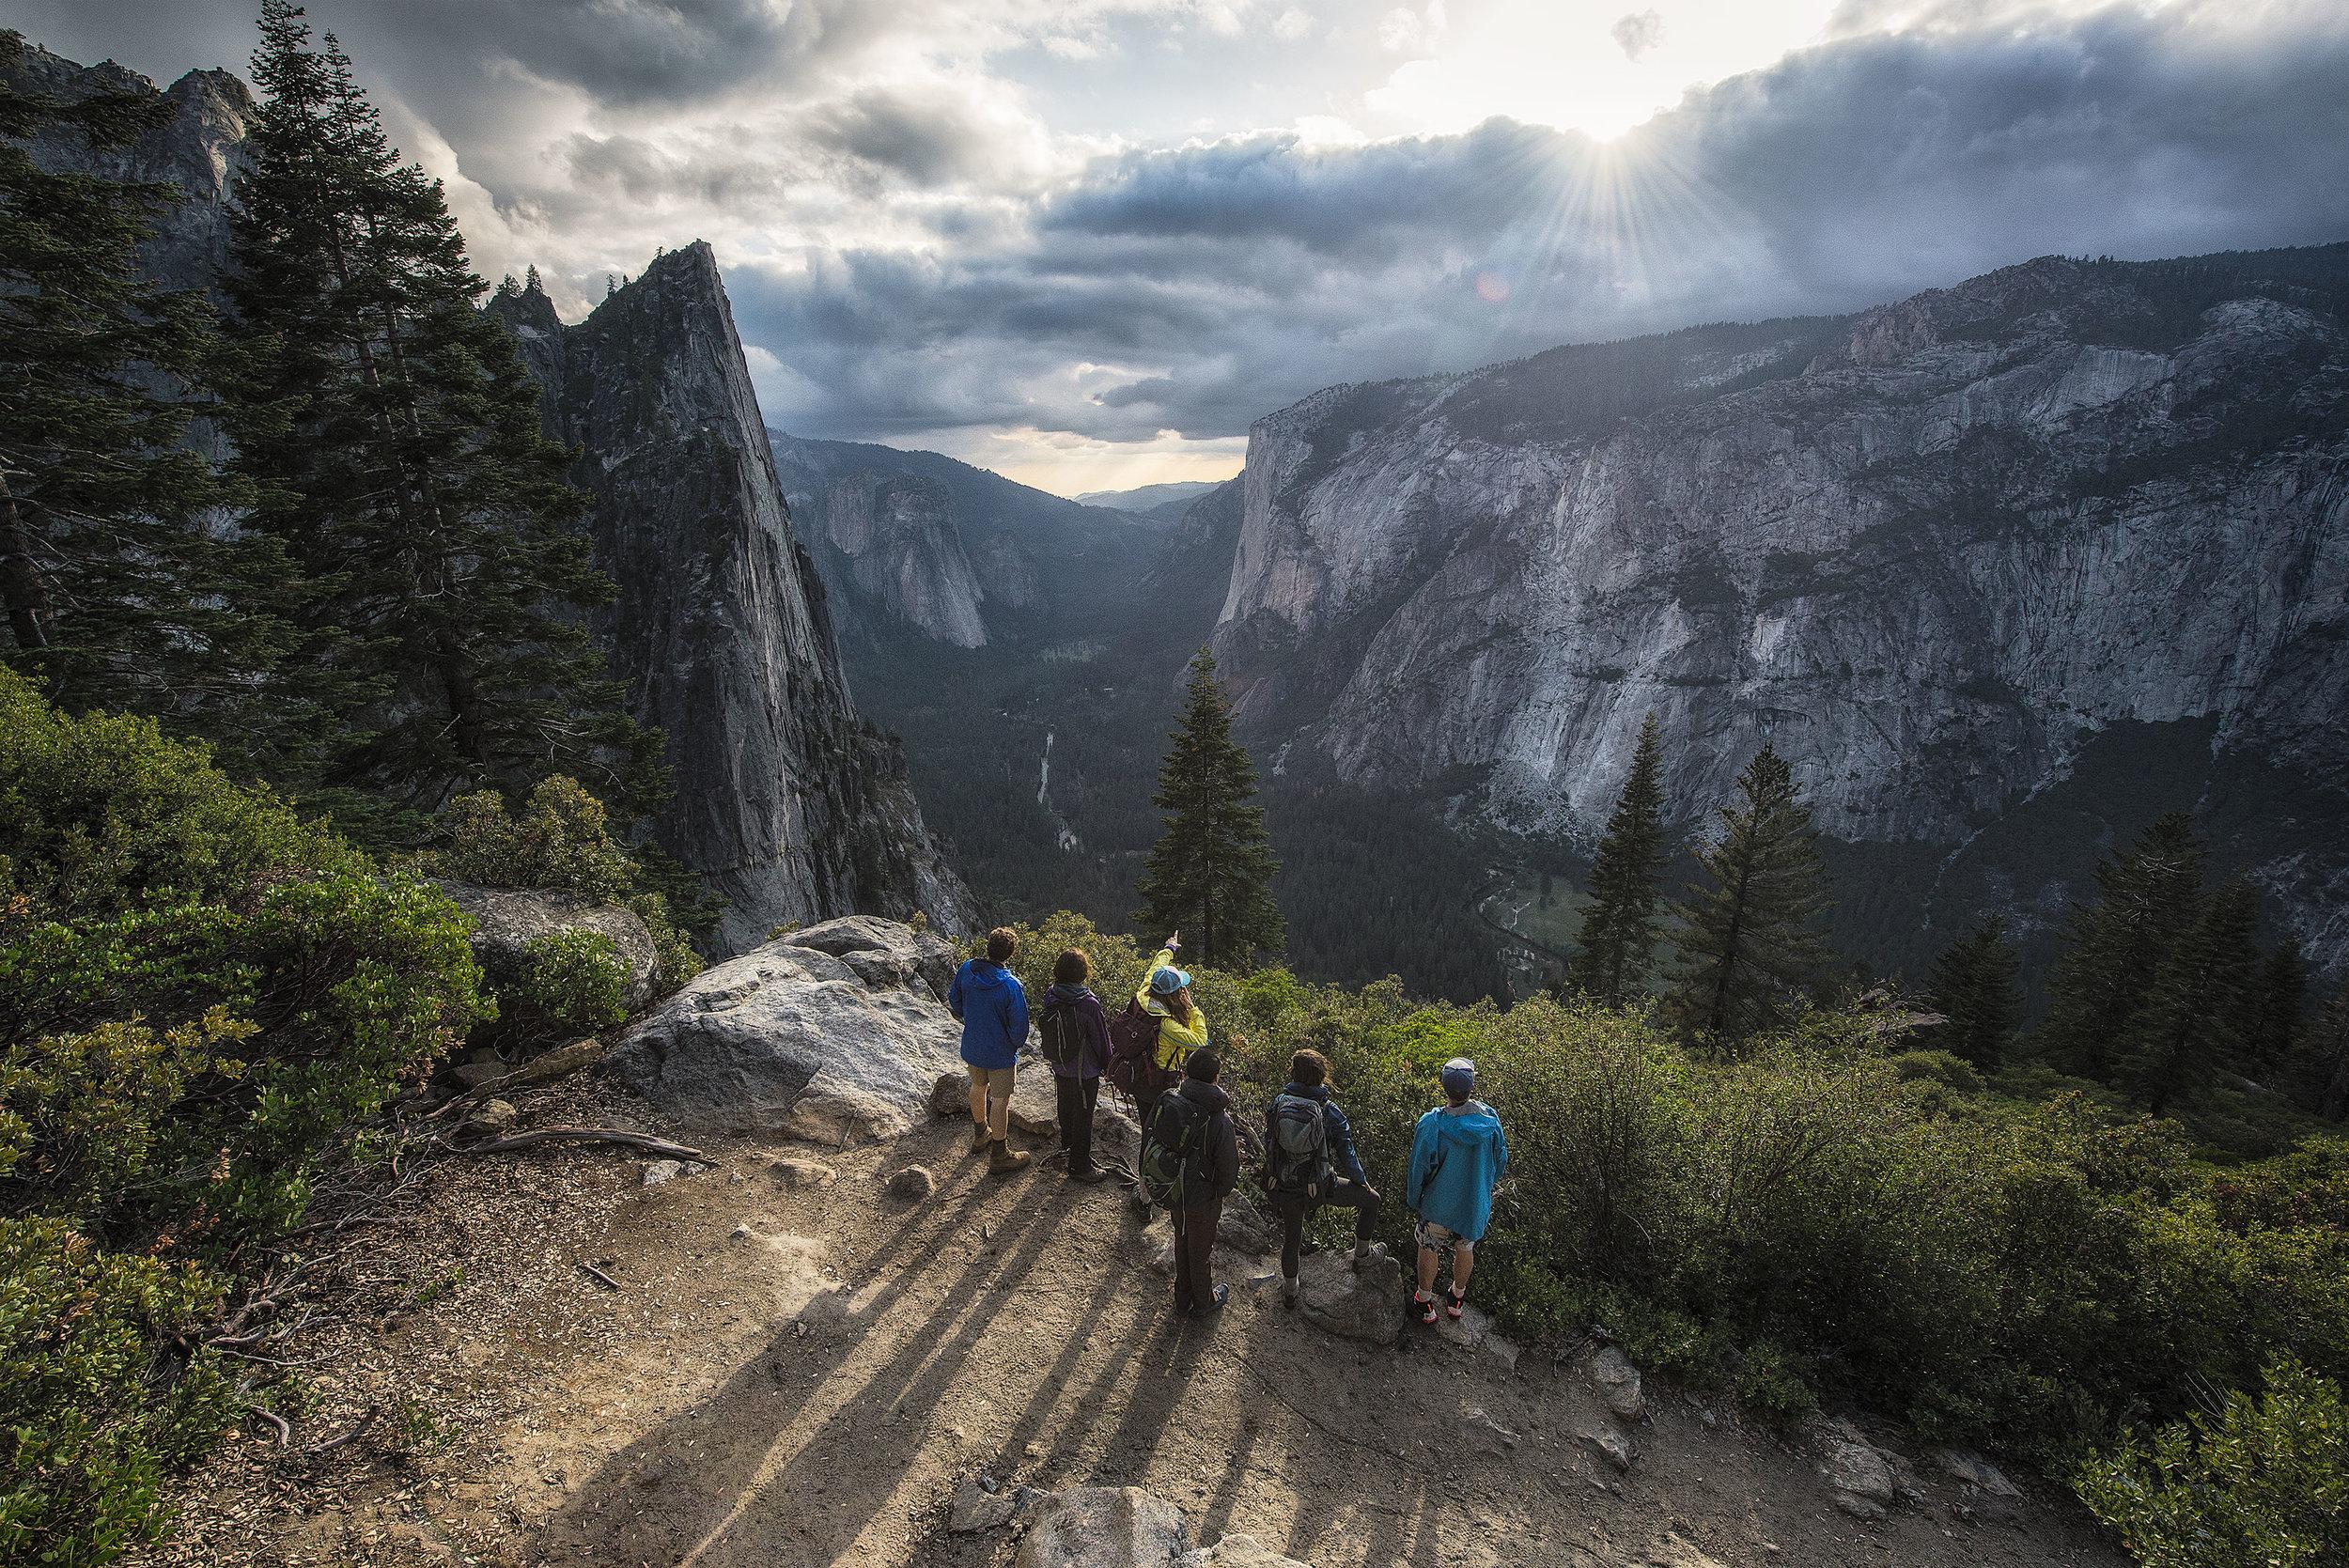 austin-trigg-yosemite-national-park-Group-hike-four-Mile-Trail-sunset-lifestyle.jpg